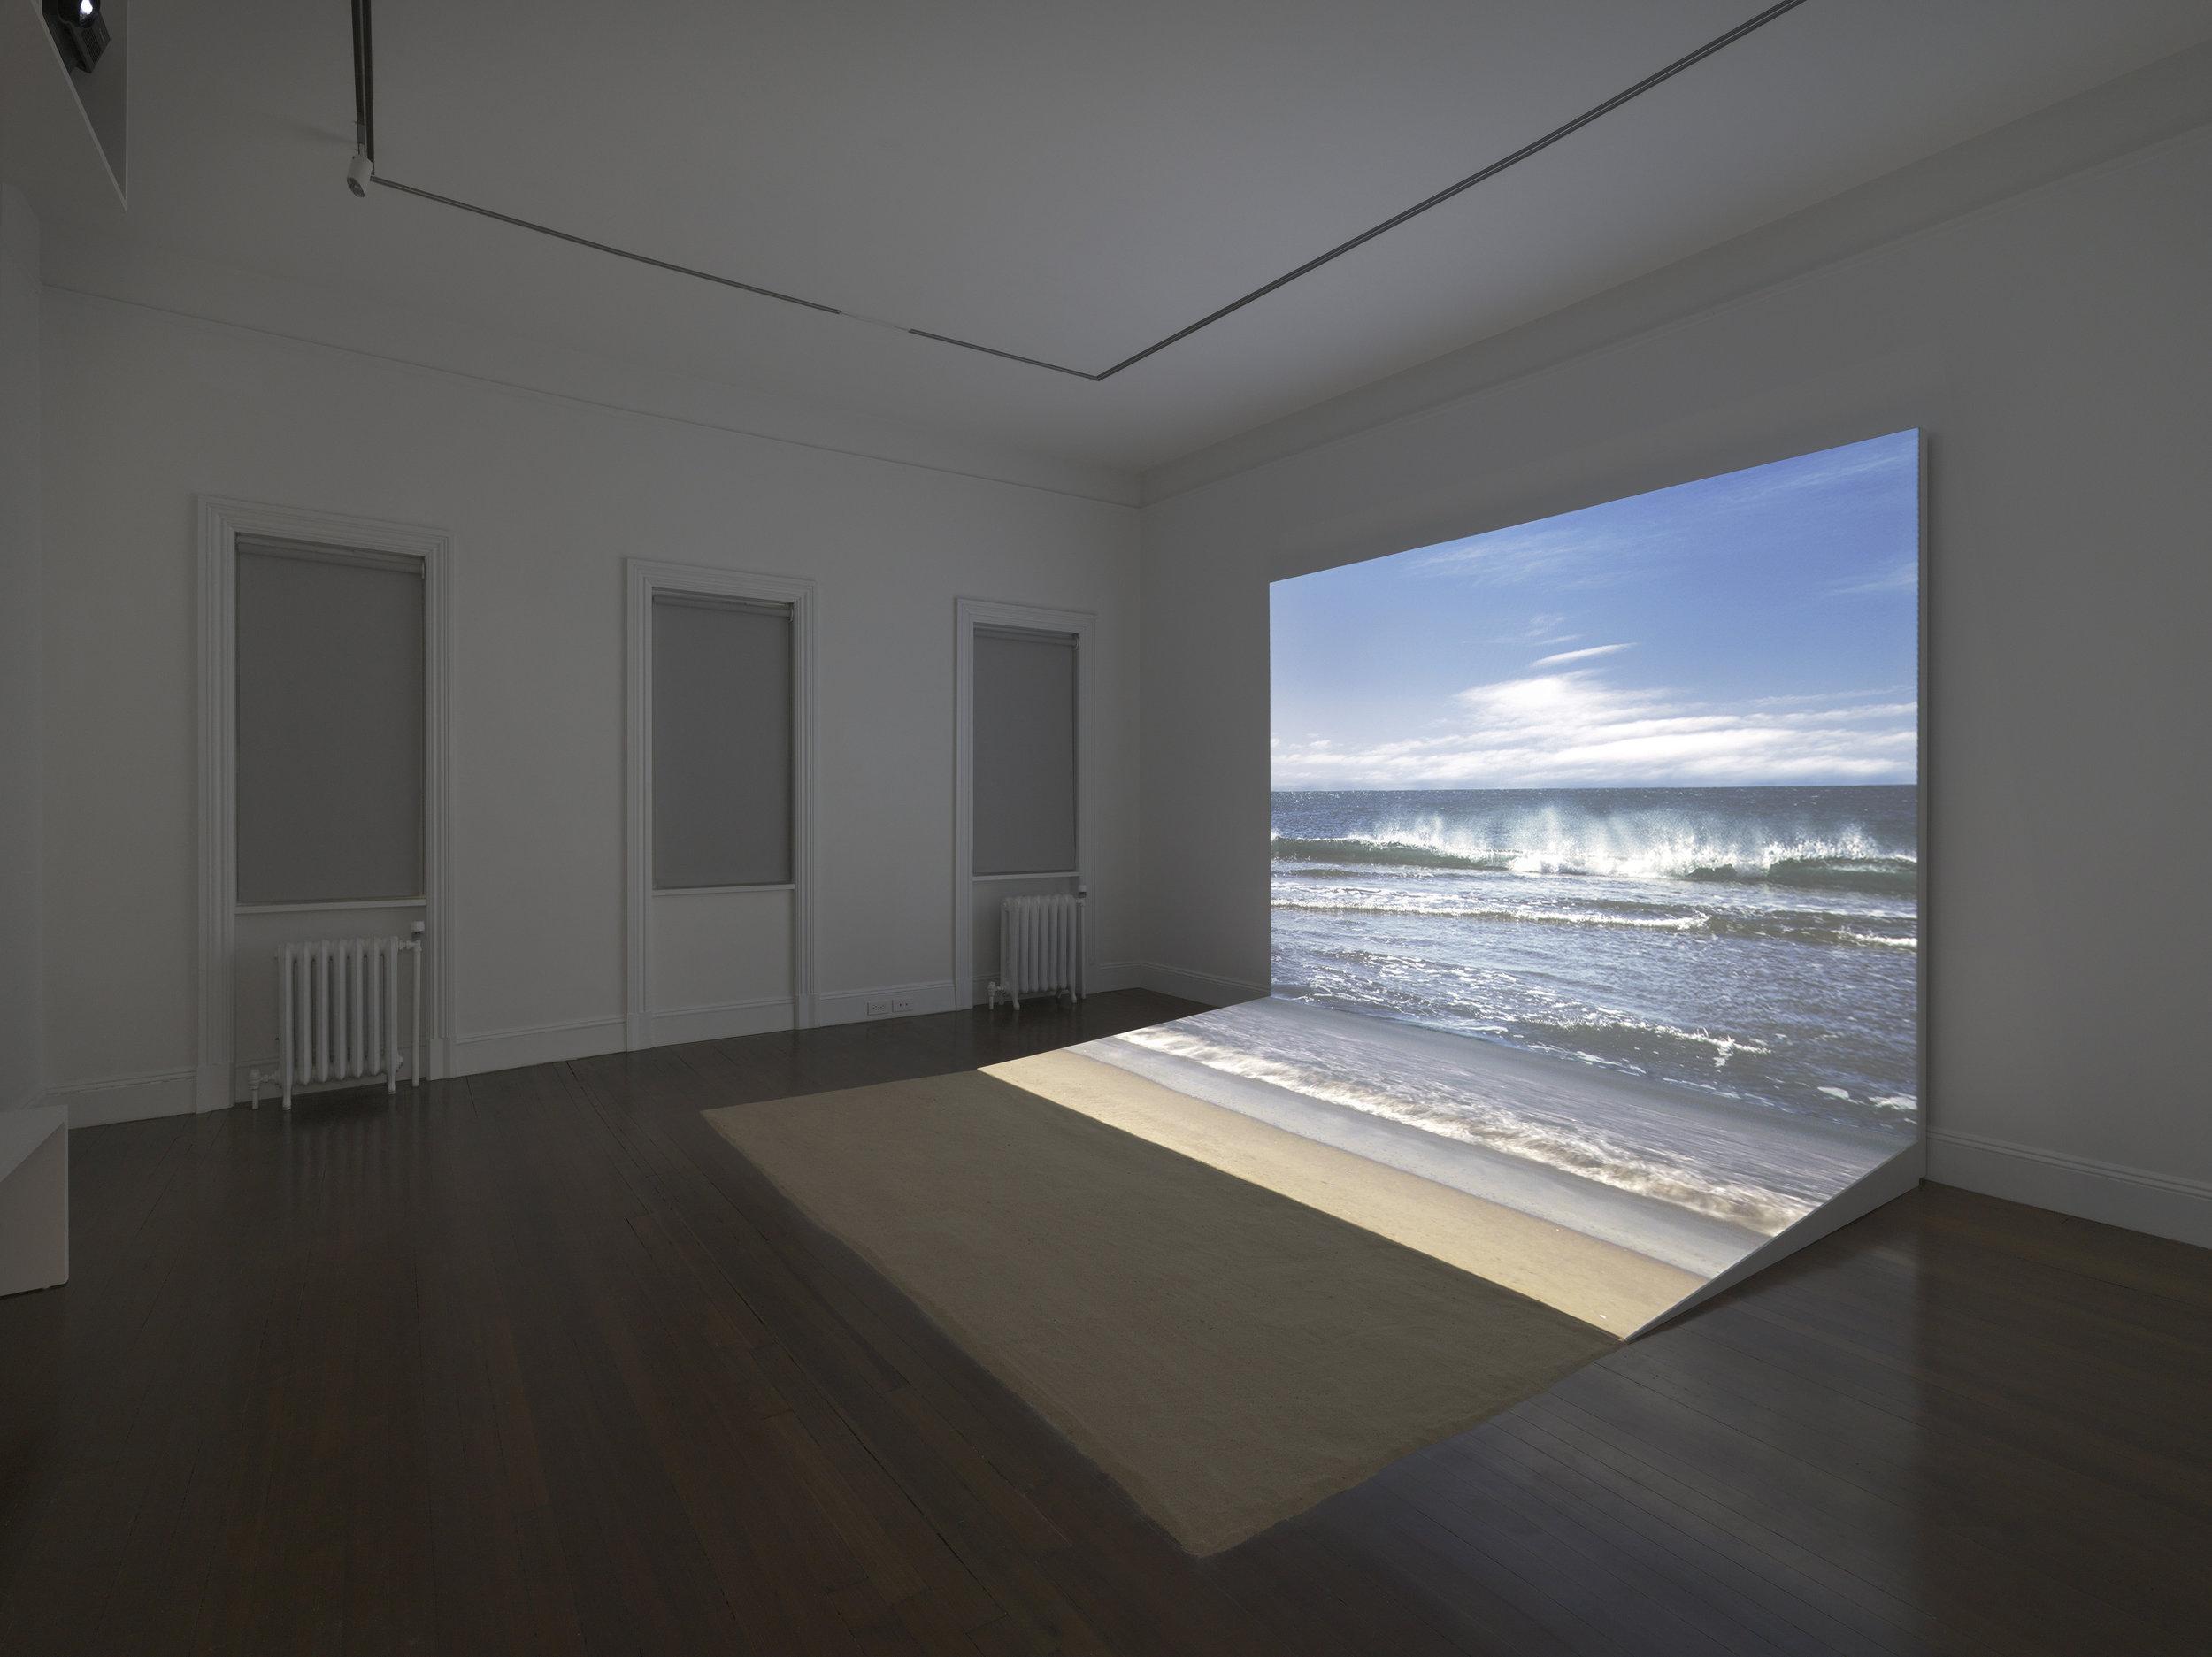 Bord de mer,2009. Agnes Varda,Installation view, 2017 Blum & Poe, New York Photo: Genevieve Hanson Courtesy of the artist and Blum & Poe, Los Angeles/New York/Tokyo